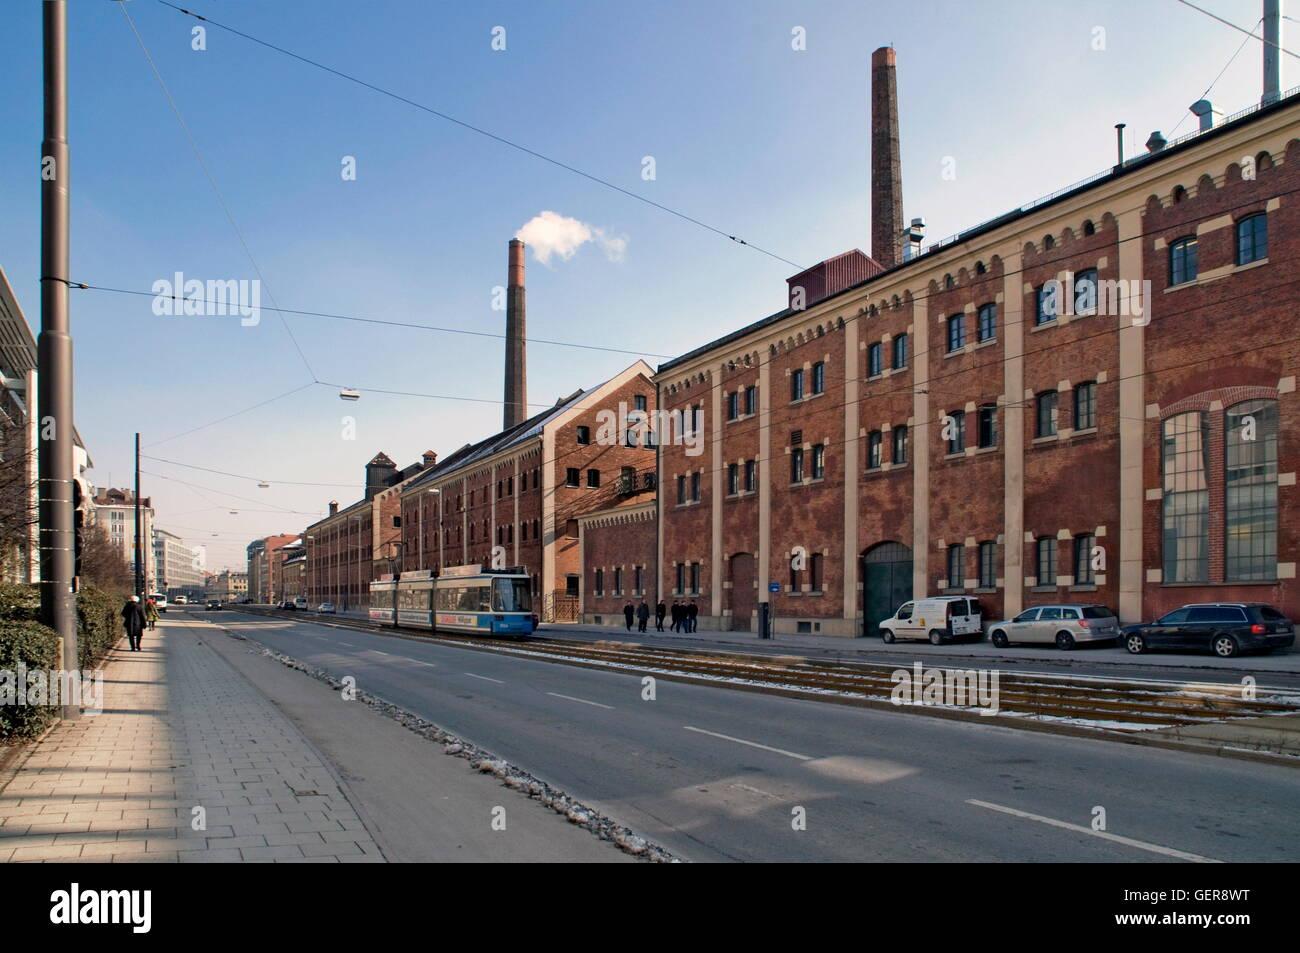 geography / travel, Germany, Bavaria, Munich, Augustiner brewery, Landsberger Strasse, Schwanthalerhoehe, - Stock Image